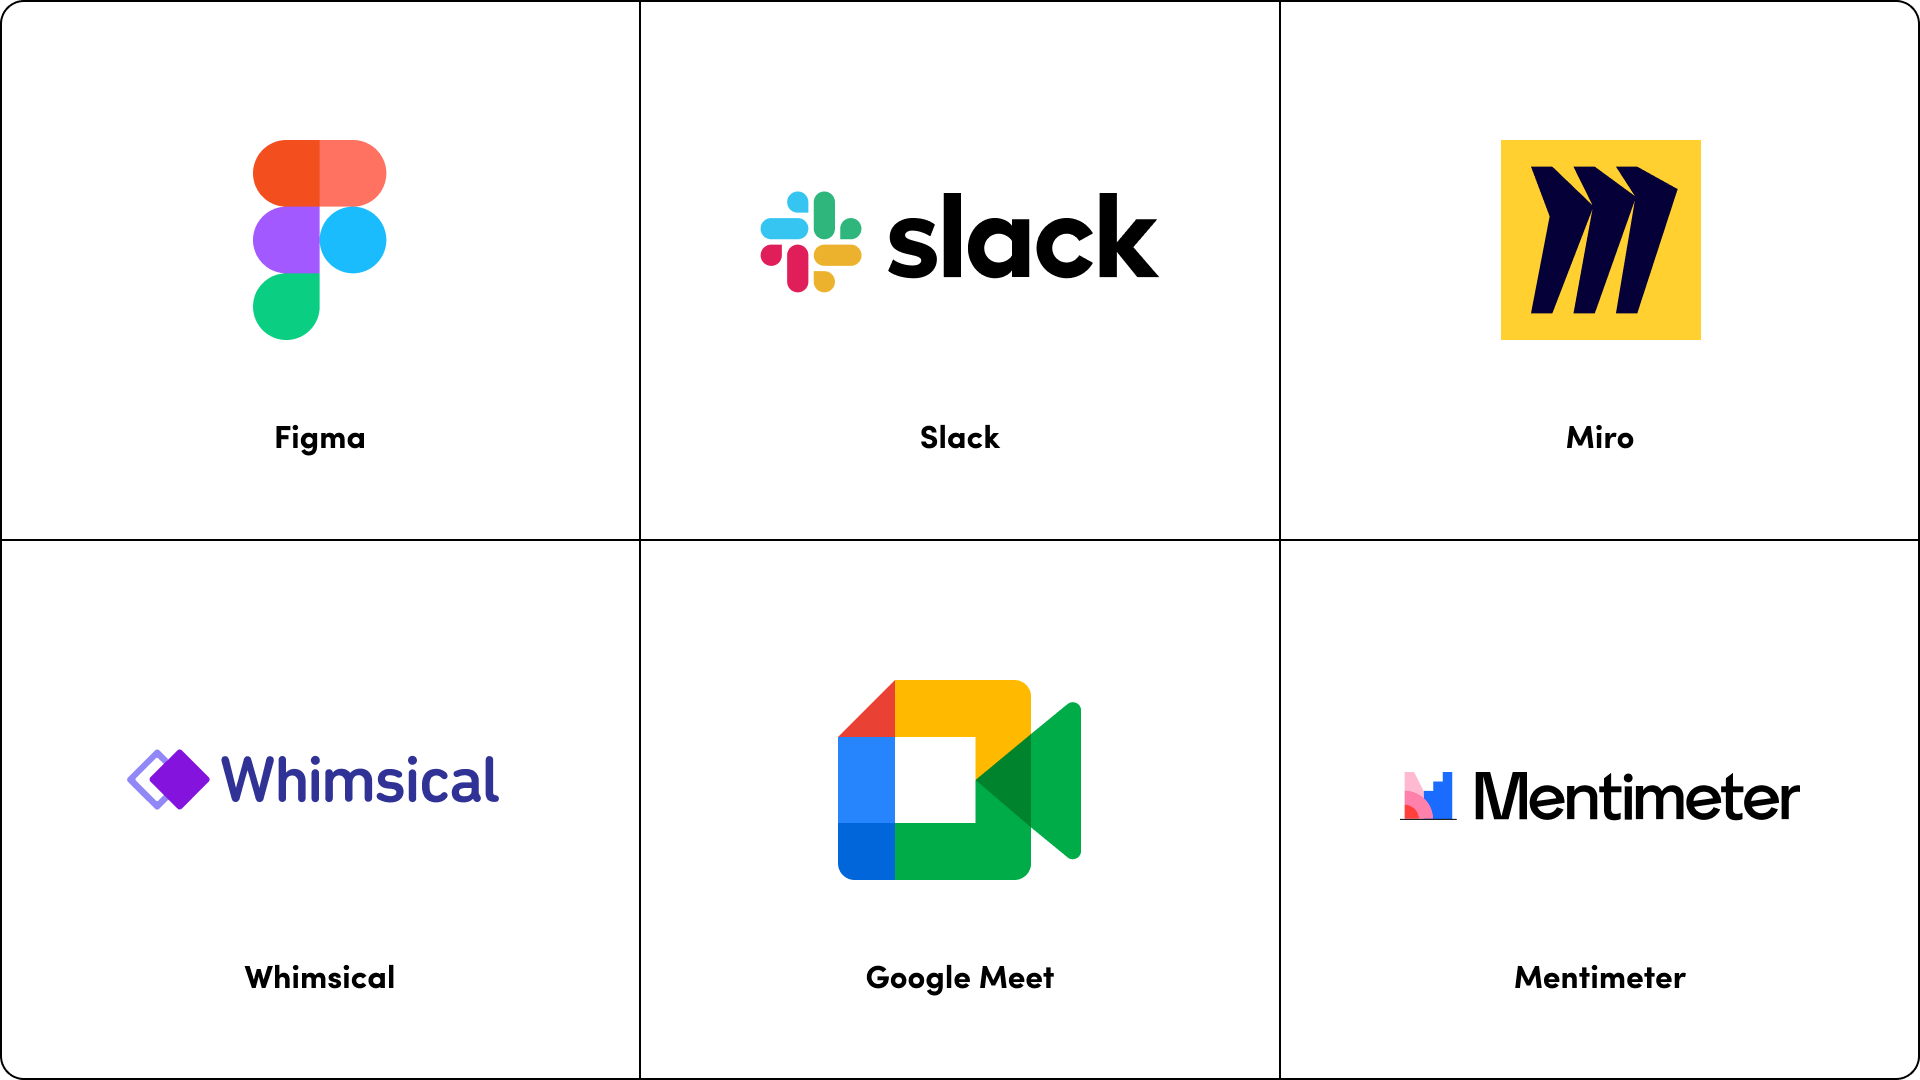 project management tool, collaboration tools - Figma, Slack, Miro, Whimsical, Google Meet, Mentimeter